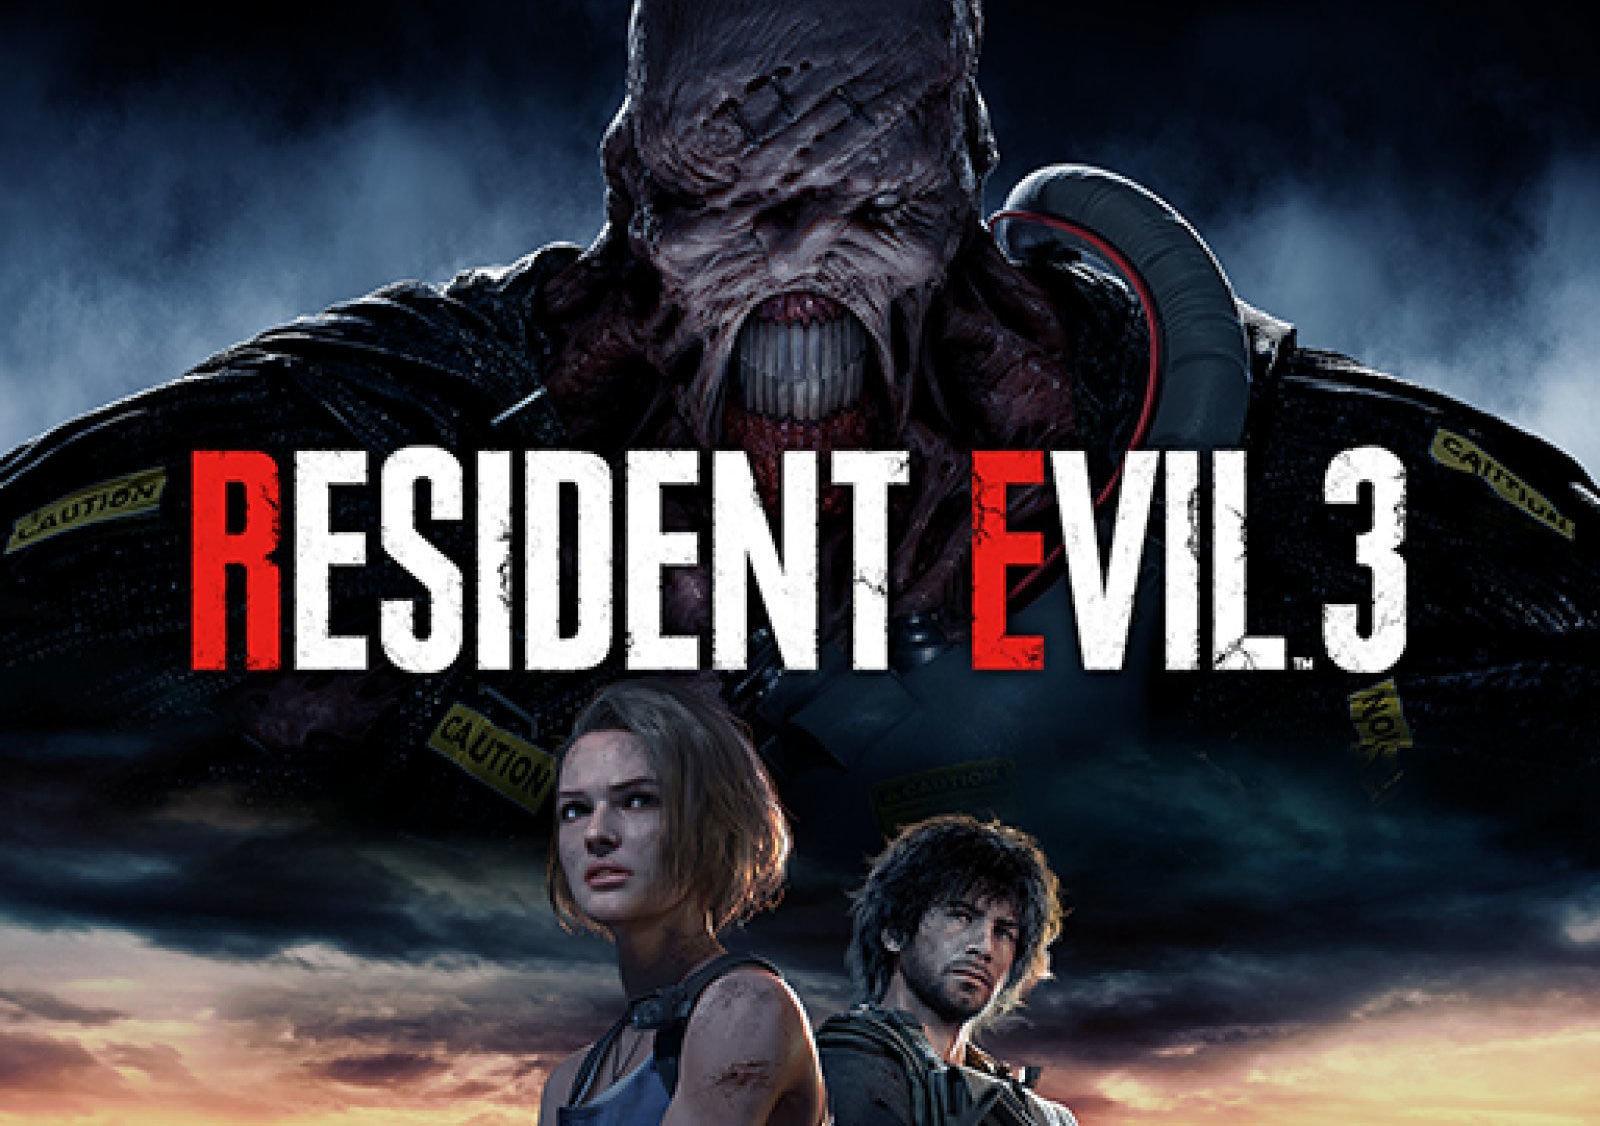 resident evil 3 (steam) klyuch srazu 549 rur